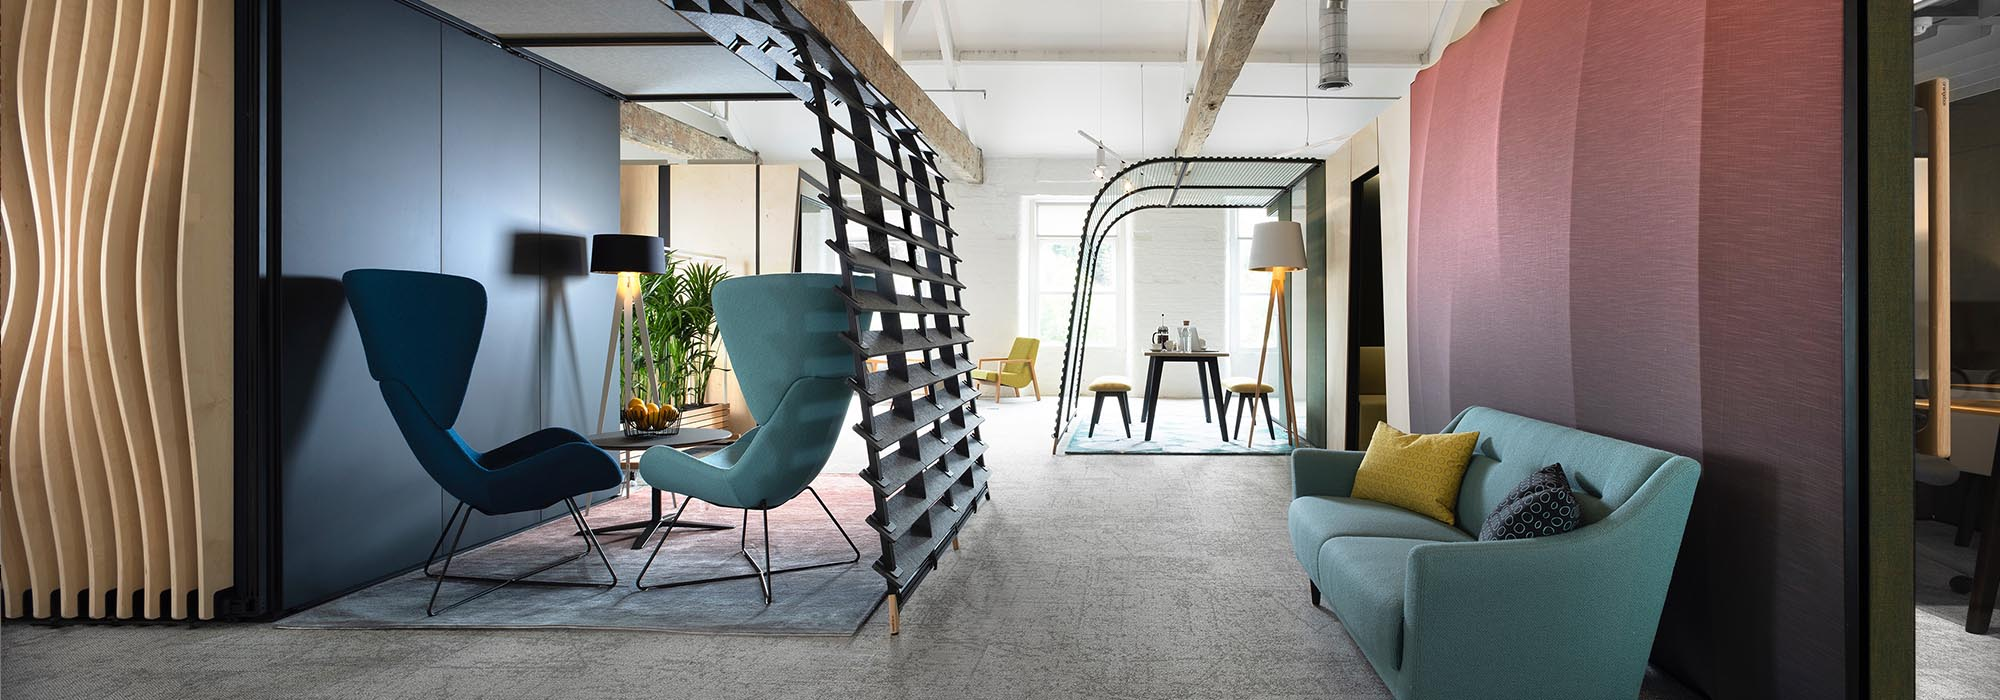 Think Furniture Hybrid Office Design